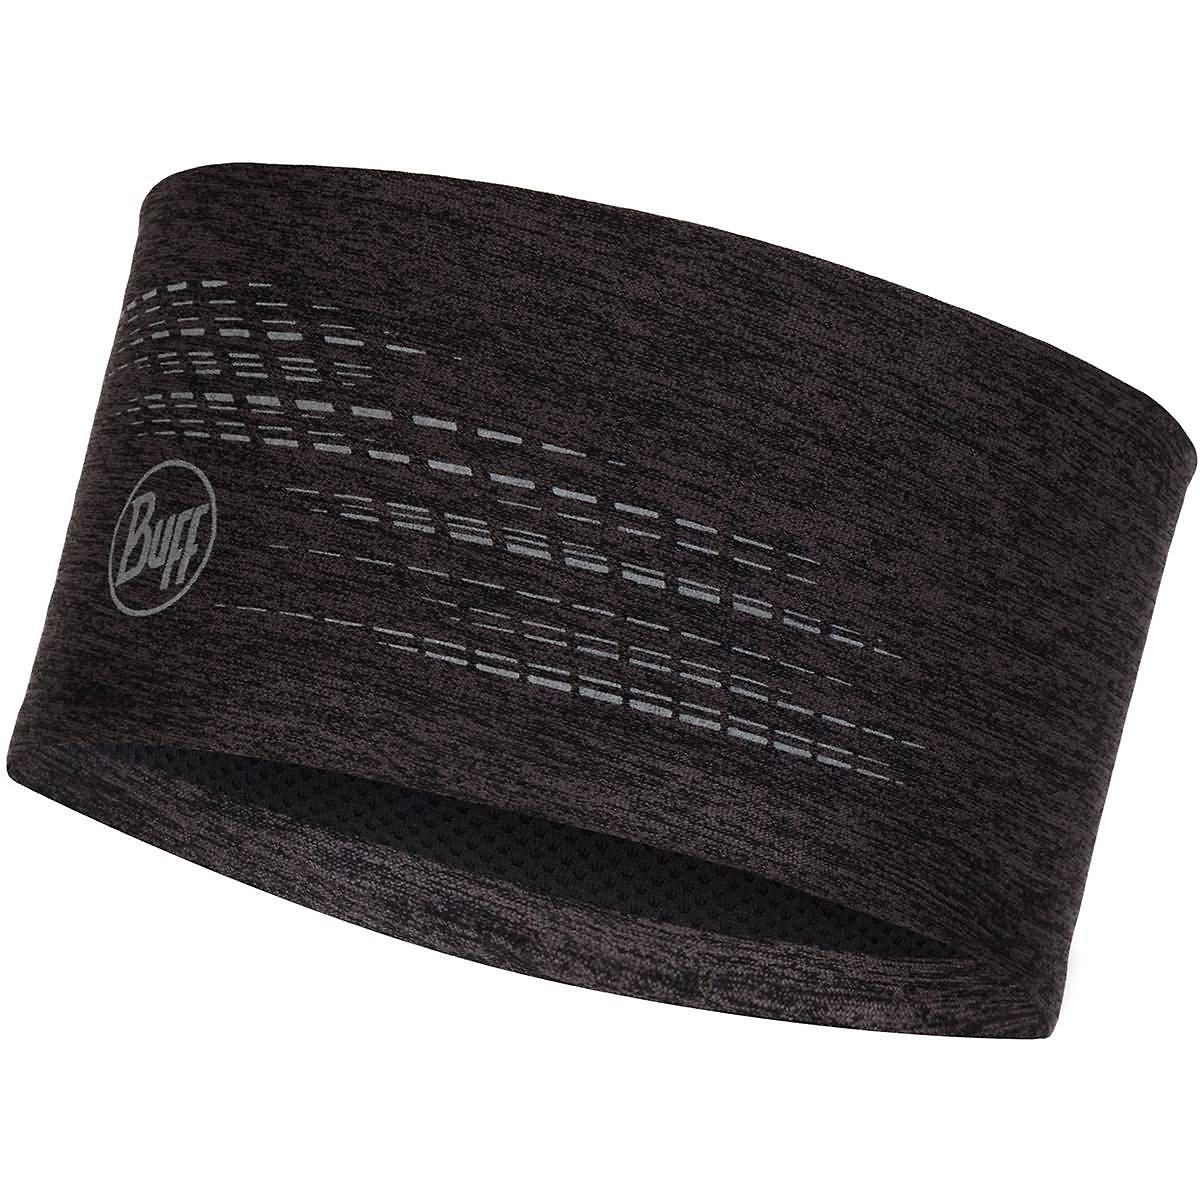 Buff Dryflx Headband - Color: Black, Black, large, image 1